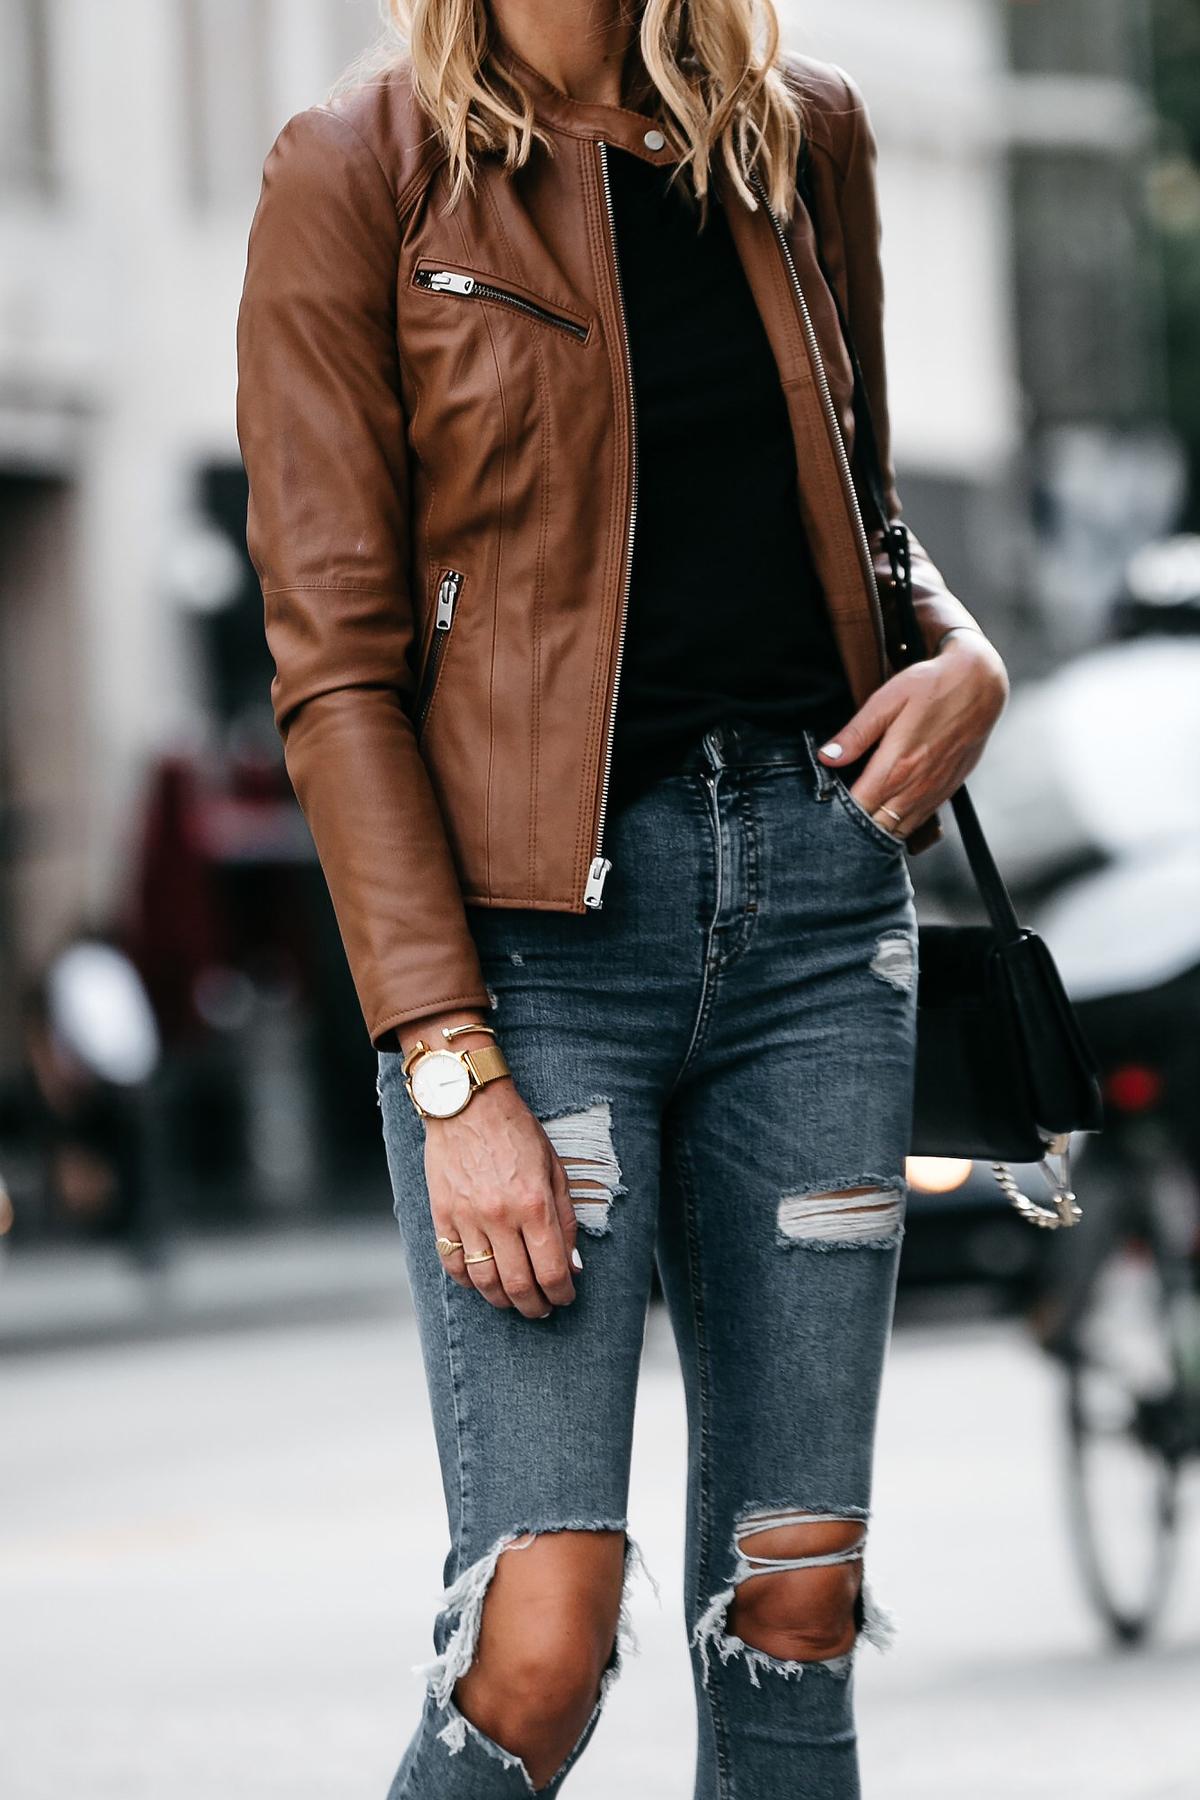 Tan Leather Jacket Black Tshirt Denim Ripped Skinny Jeans Outfit Fashion Jackson Dallas Blogger Fashion Blogger Street Style